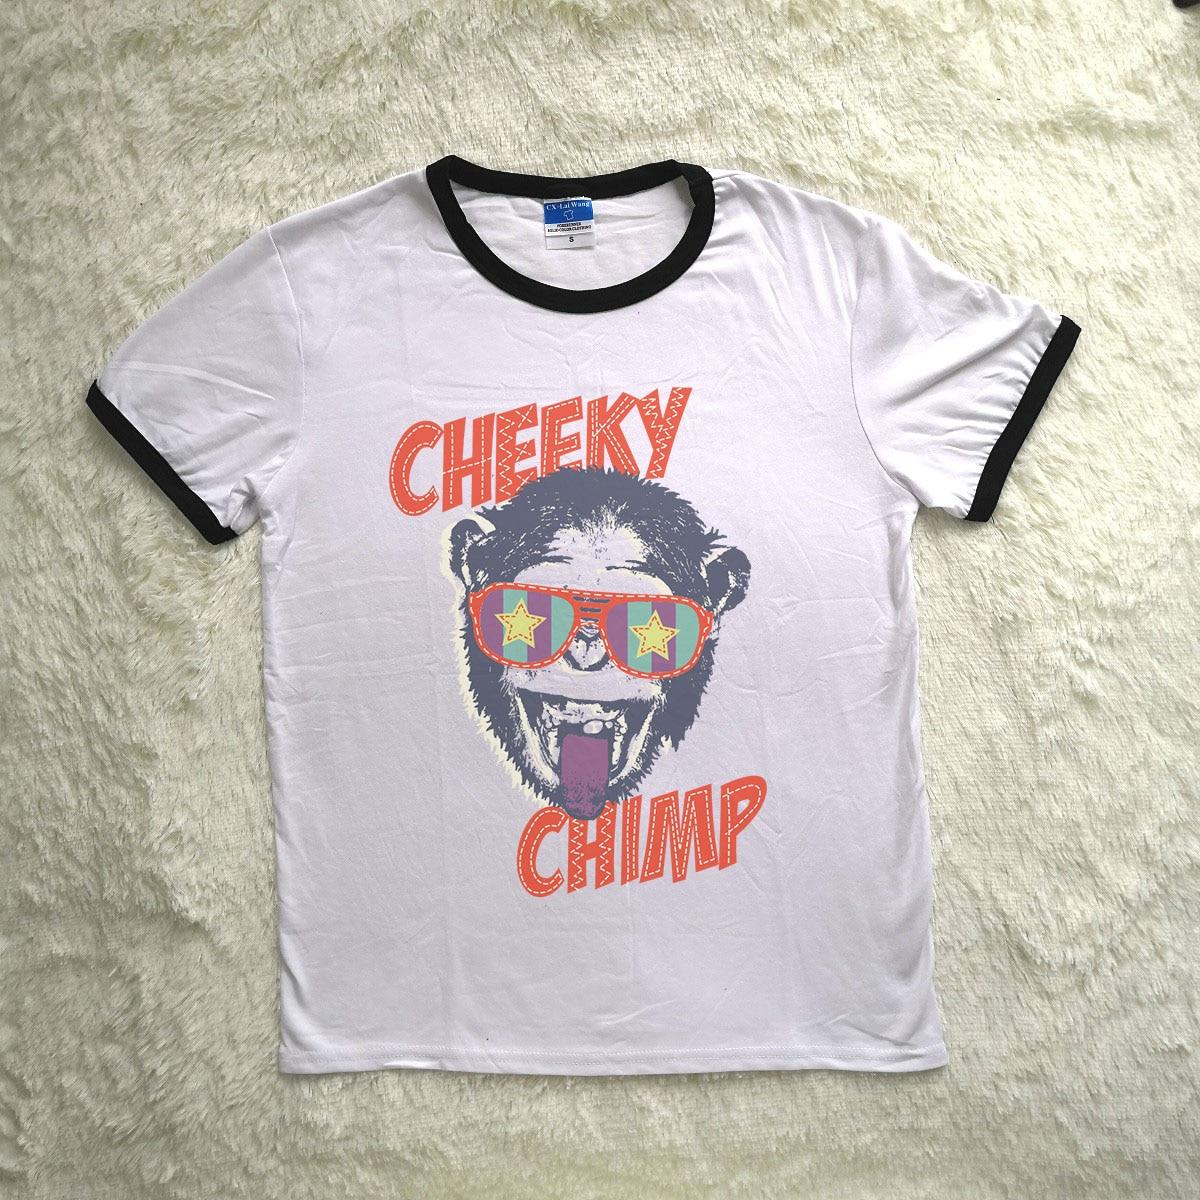 Hillbilly Funny Arctic Monkey Women Tshirt Vintage Summer Tops Novelty Tee Short Sleeved Printed T shirt Women Harajuku Tumblr